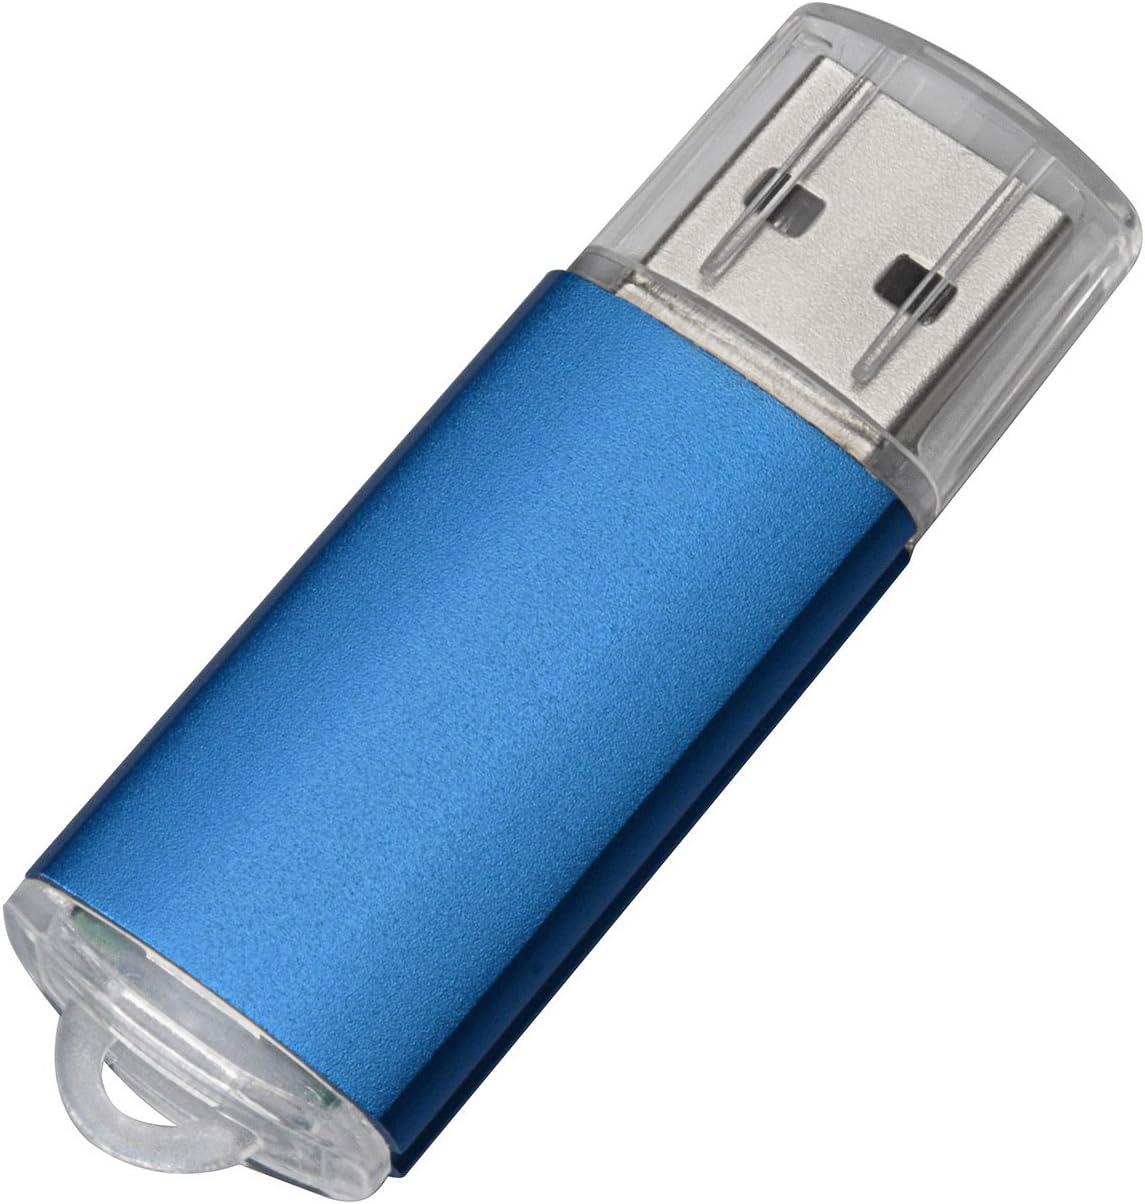 Capacity : 64GB Car USB Flash Drive Metal Waterproof and Shockproof Computer USB Memory Stick HUIJUNWENTI 8GB USB2.0 Flashing Disk